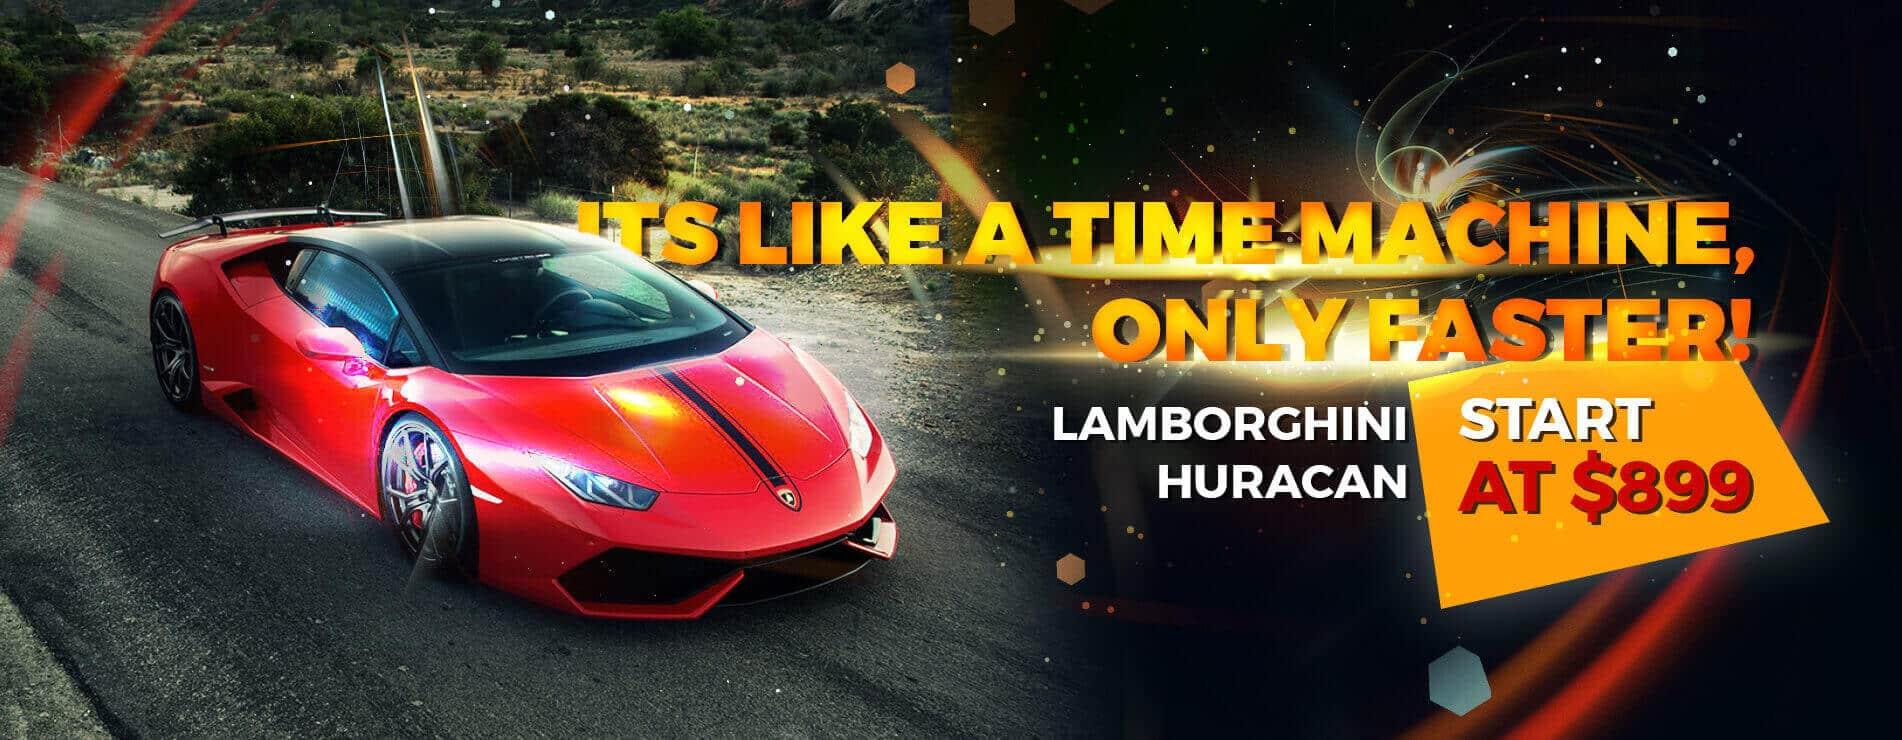 Las Vegas Exotic Car Rental - Ferrari, Lamborghini, Slingshot ...